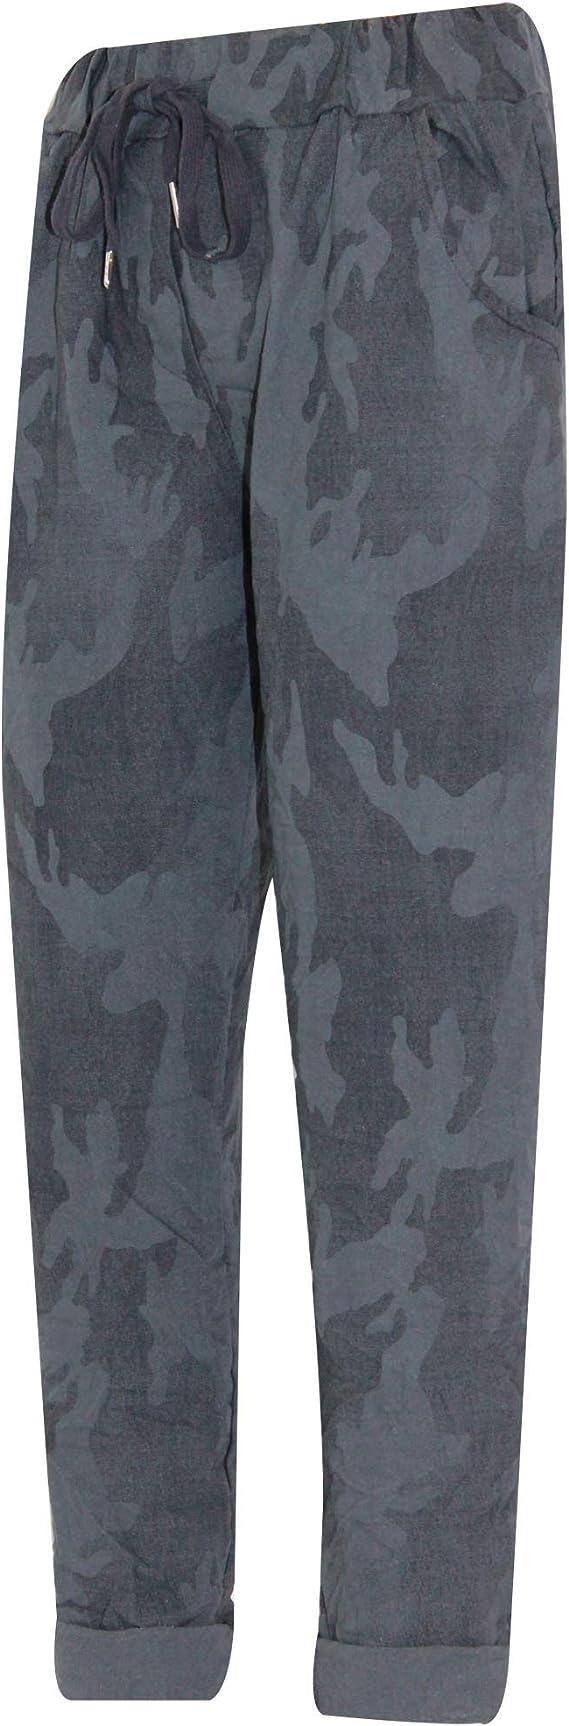 Magic Pants Magic Trousers Cropped Pants Fit 12-16 /& 18-24 Capris Animal Print